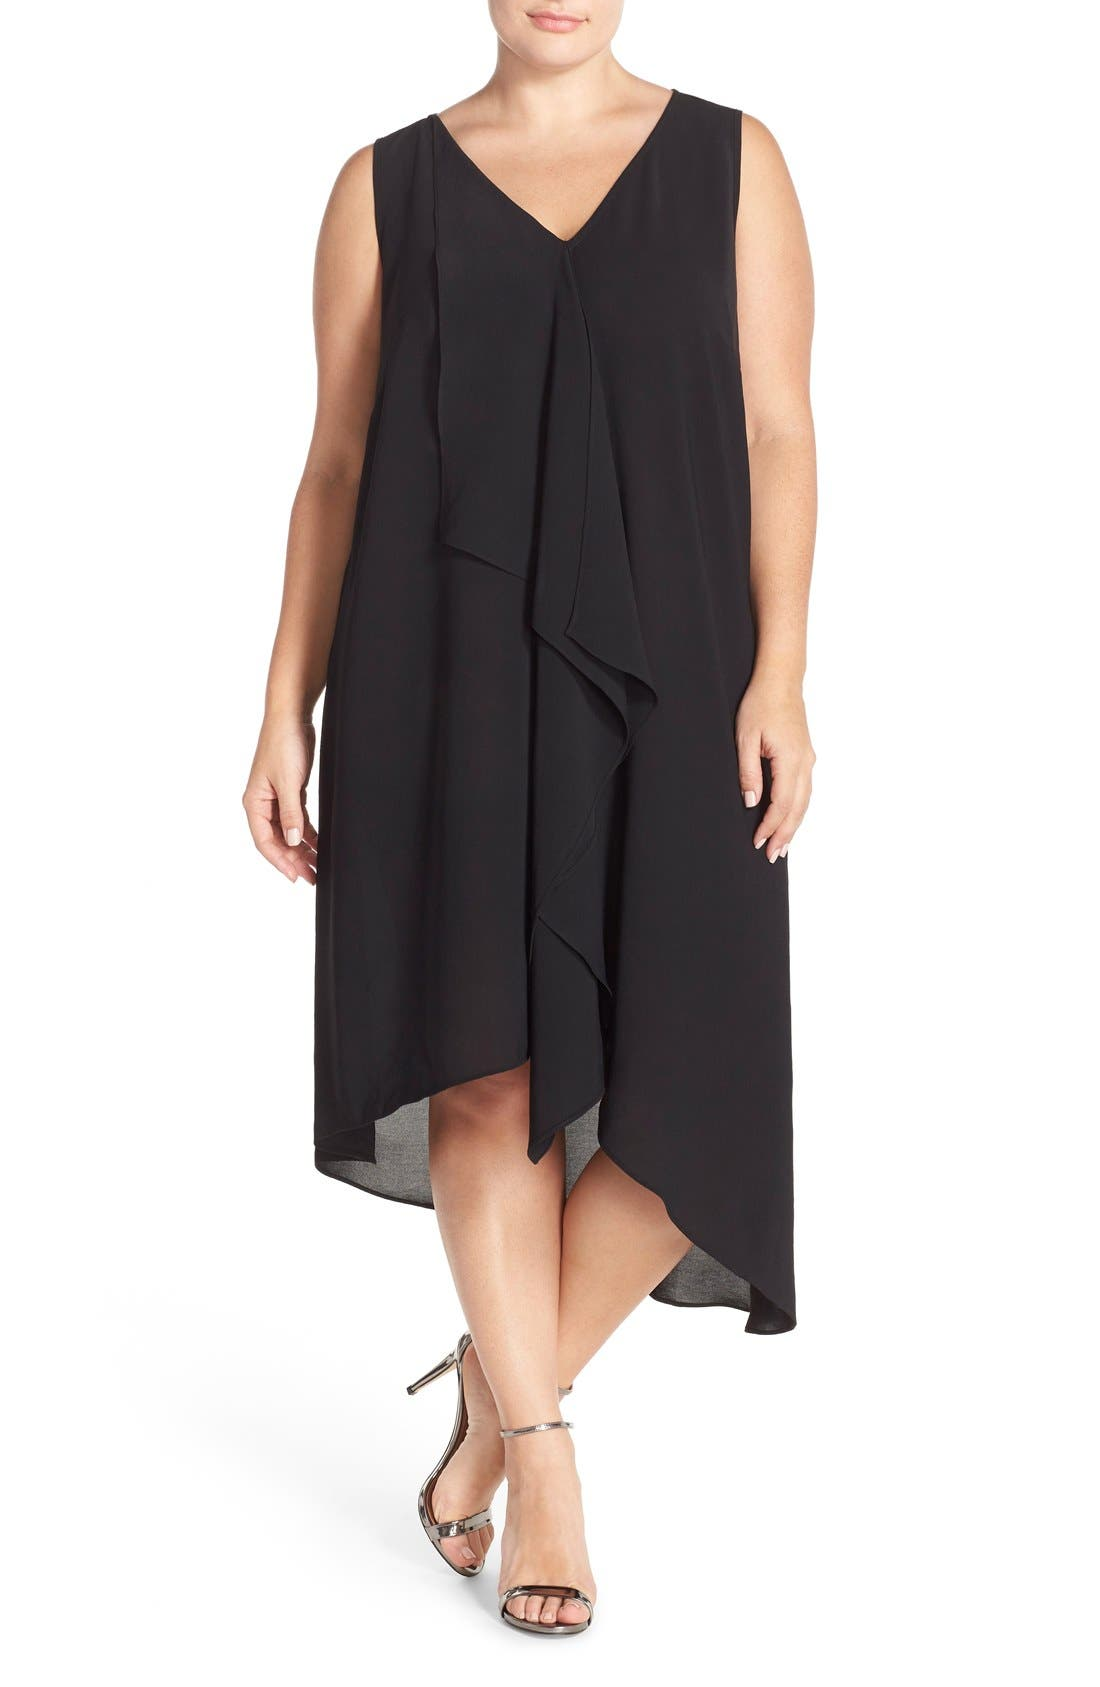 Adrianna Papell Sleeveless Asymmetrical Front Drape Crepe Shift Dress (Plus Size)